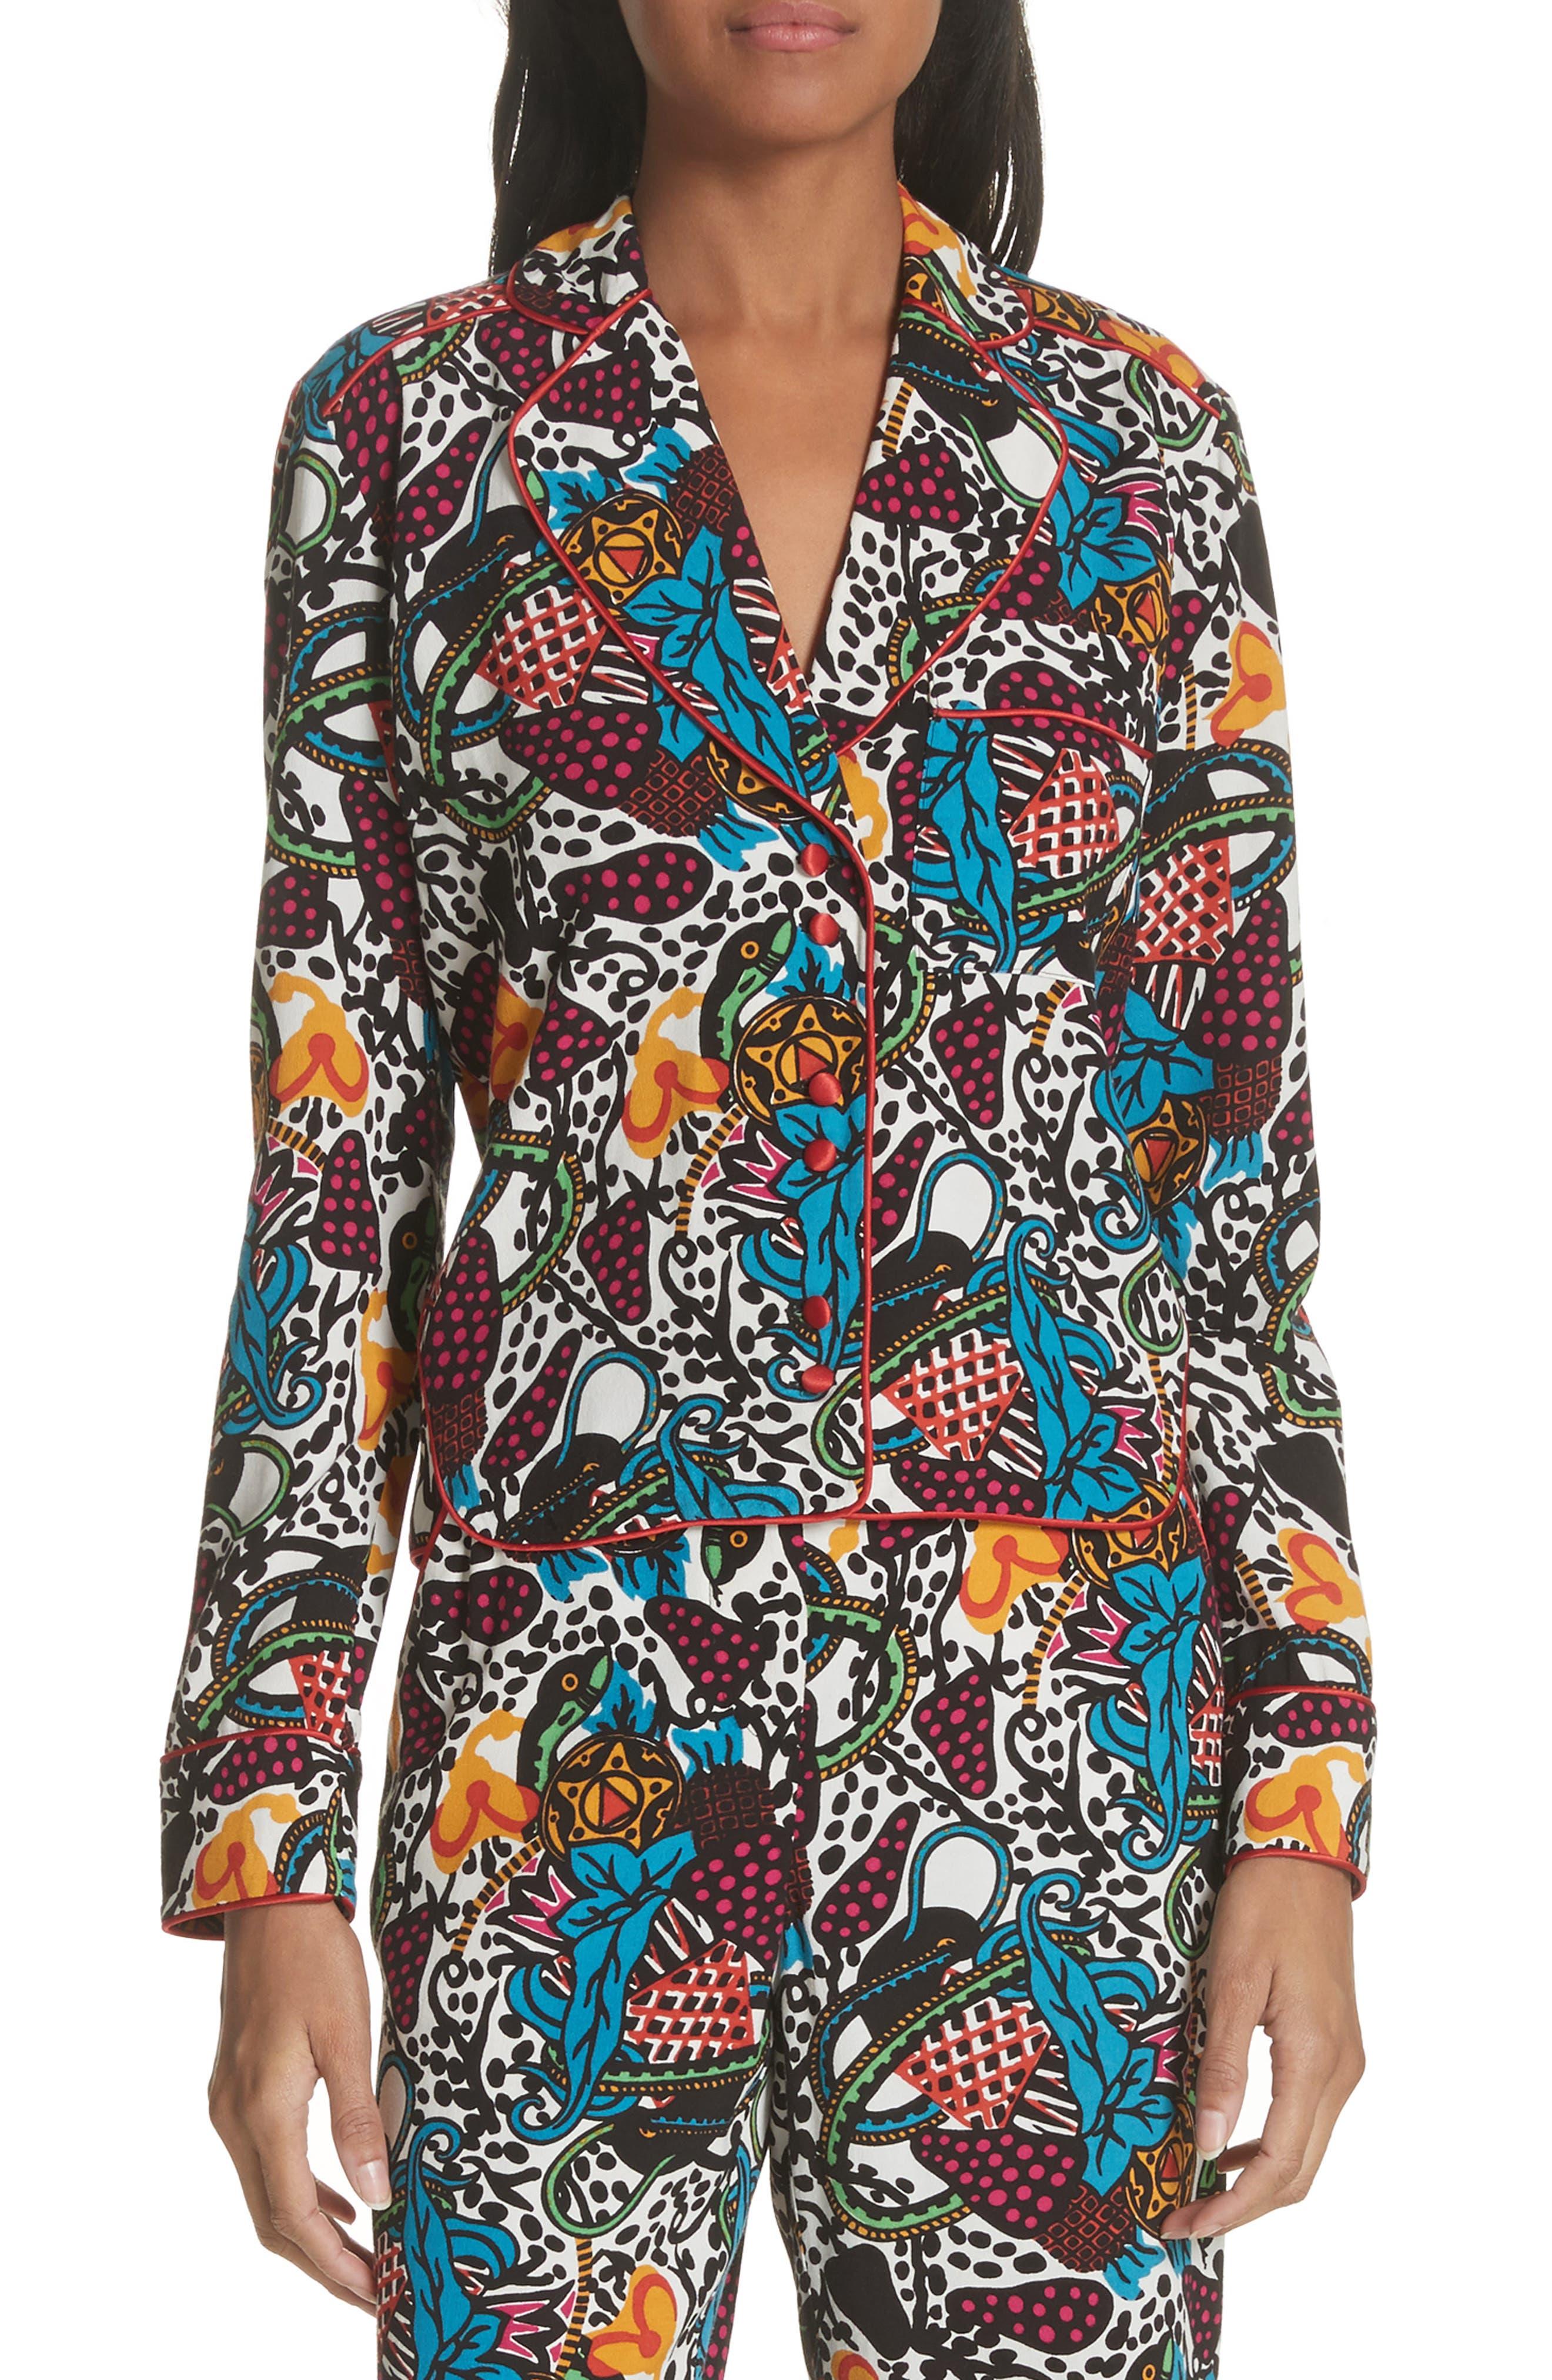 Penelope Pajama Shirt,                         Main,                         color, Off White/ Blue/ Green/ Yellow